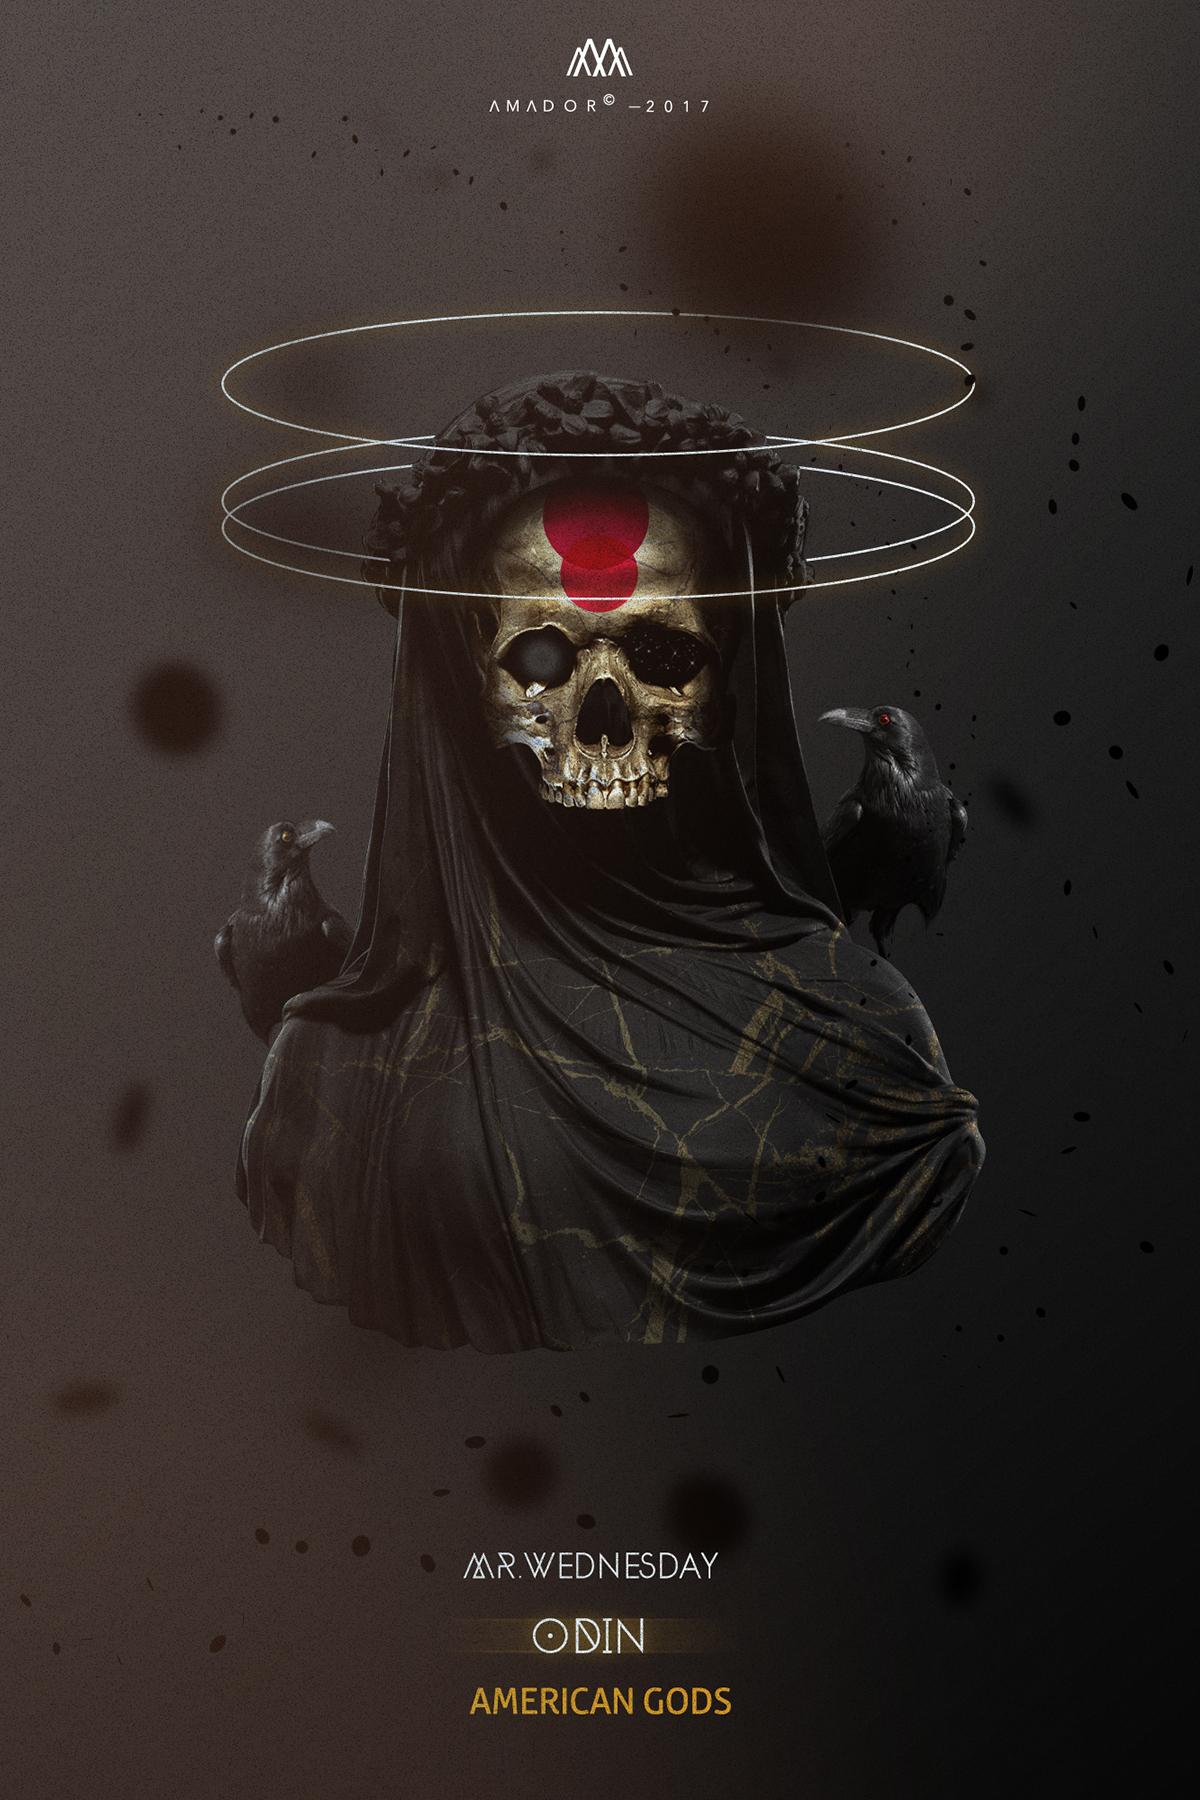 American Gods Concept Art on Wacom Gallery